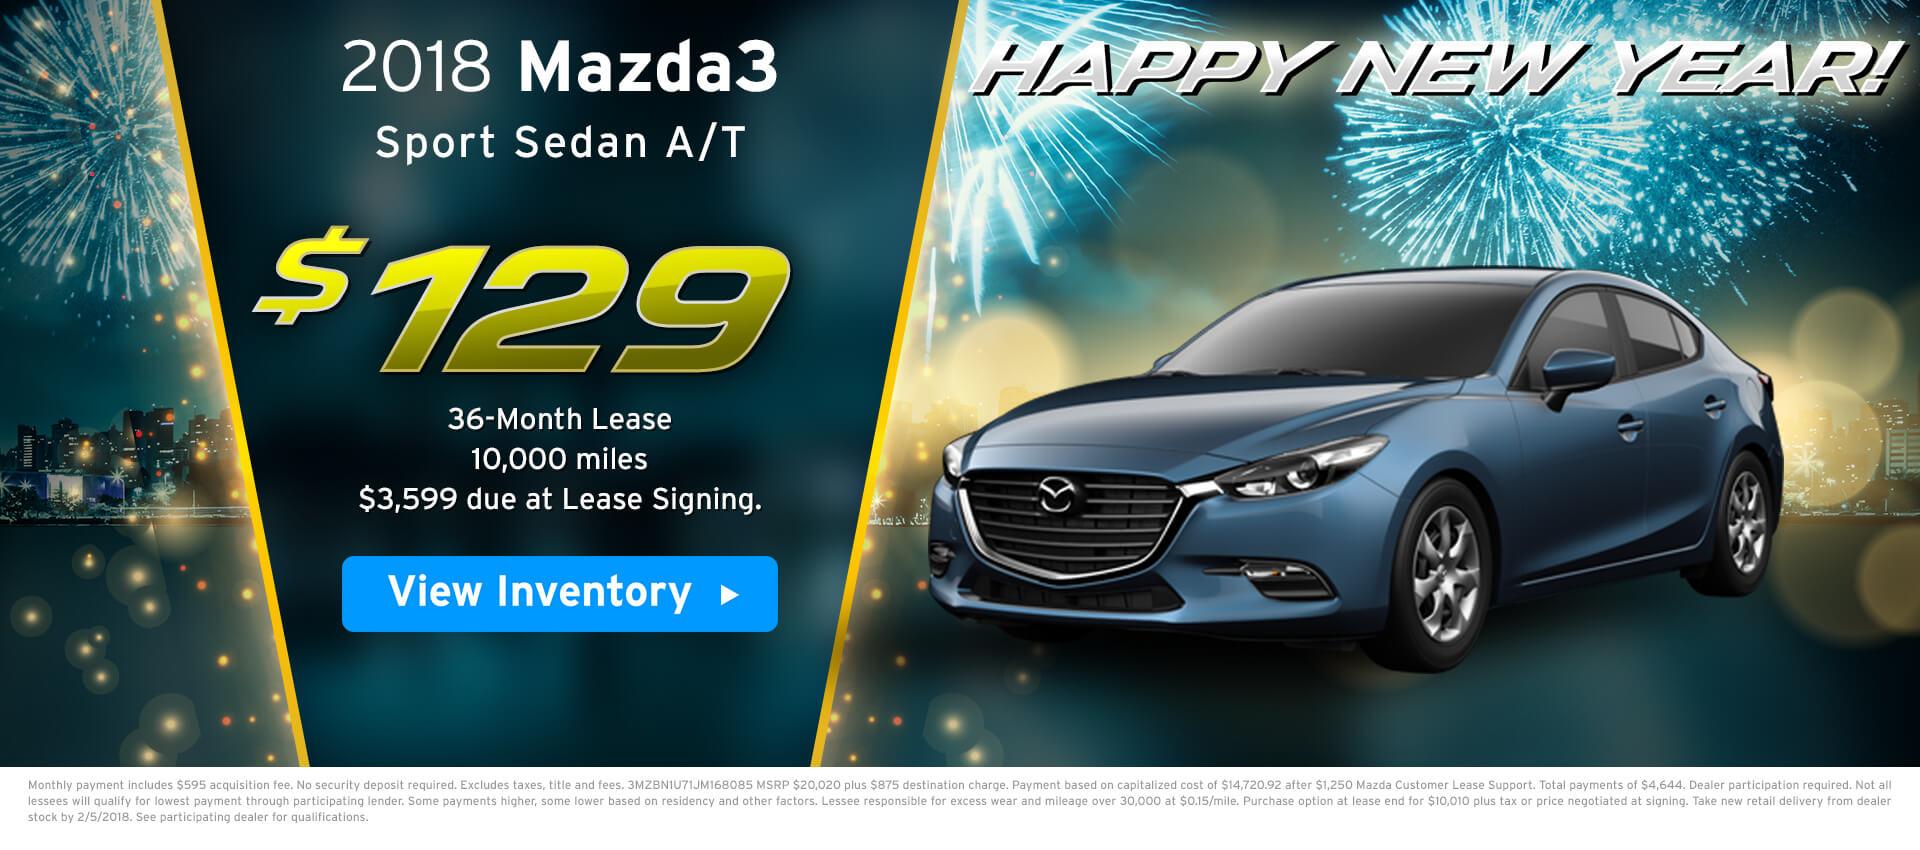 Mazda3 Lease